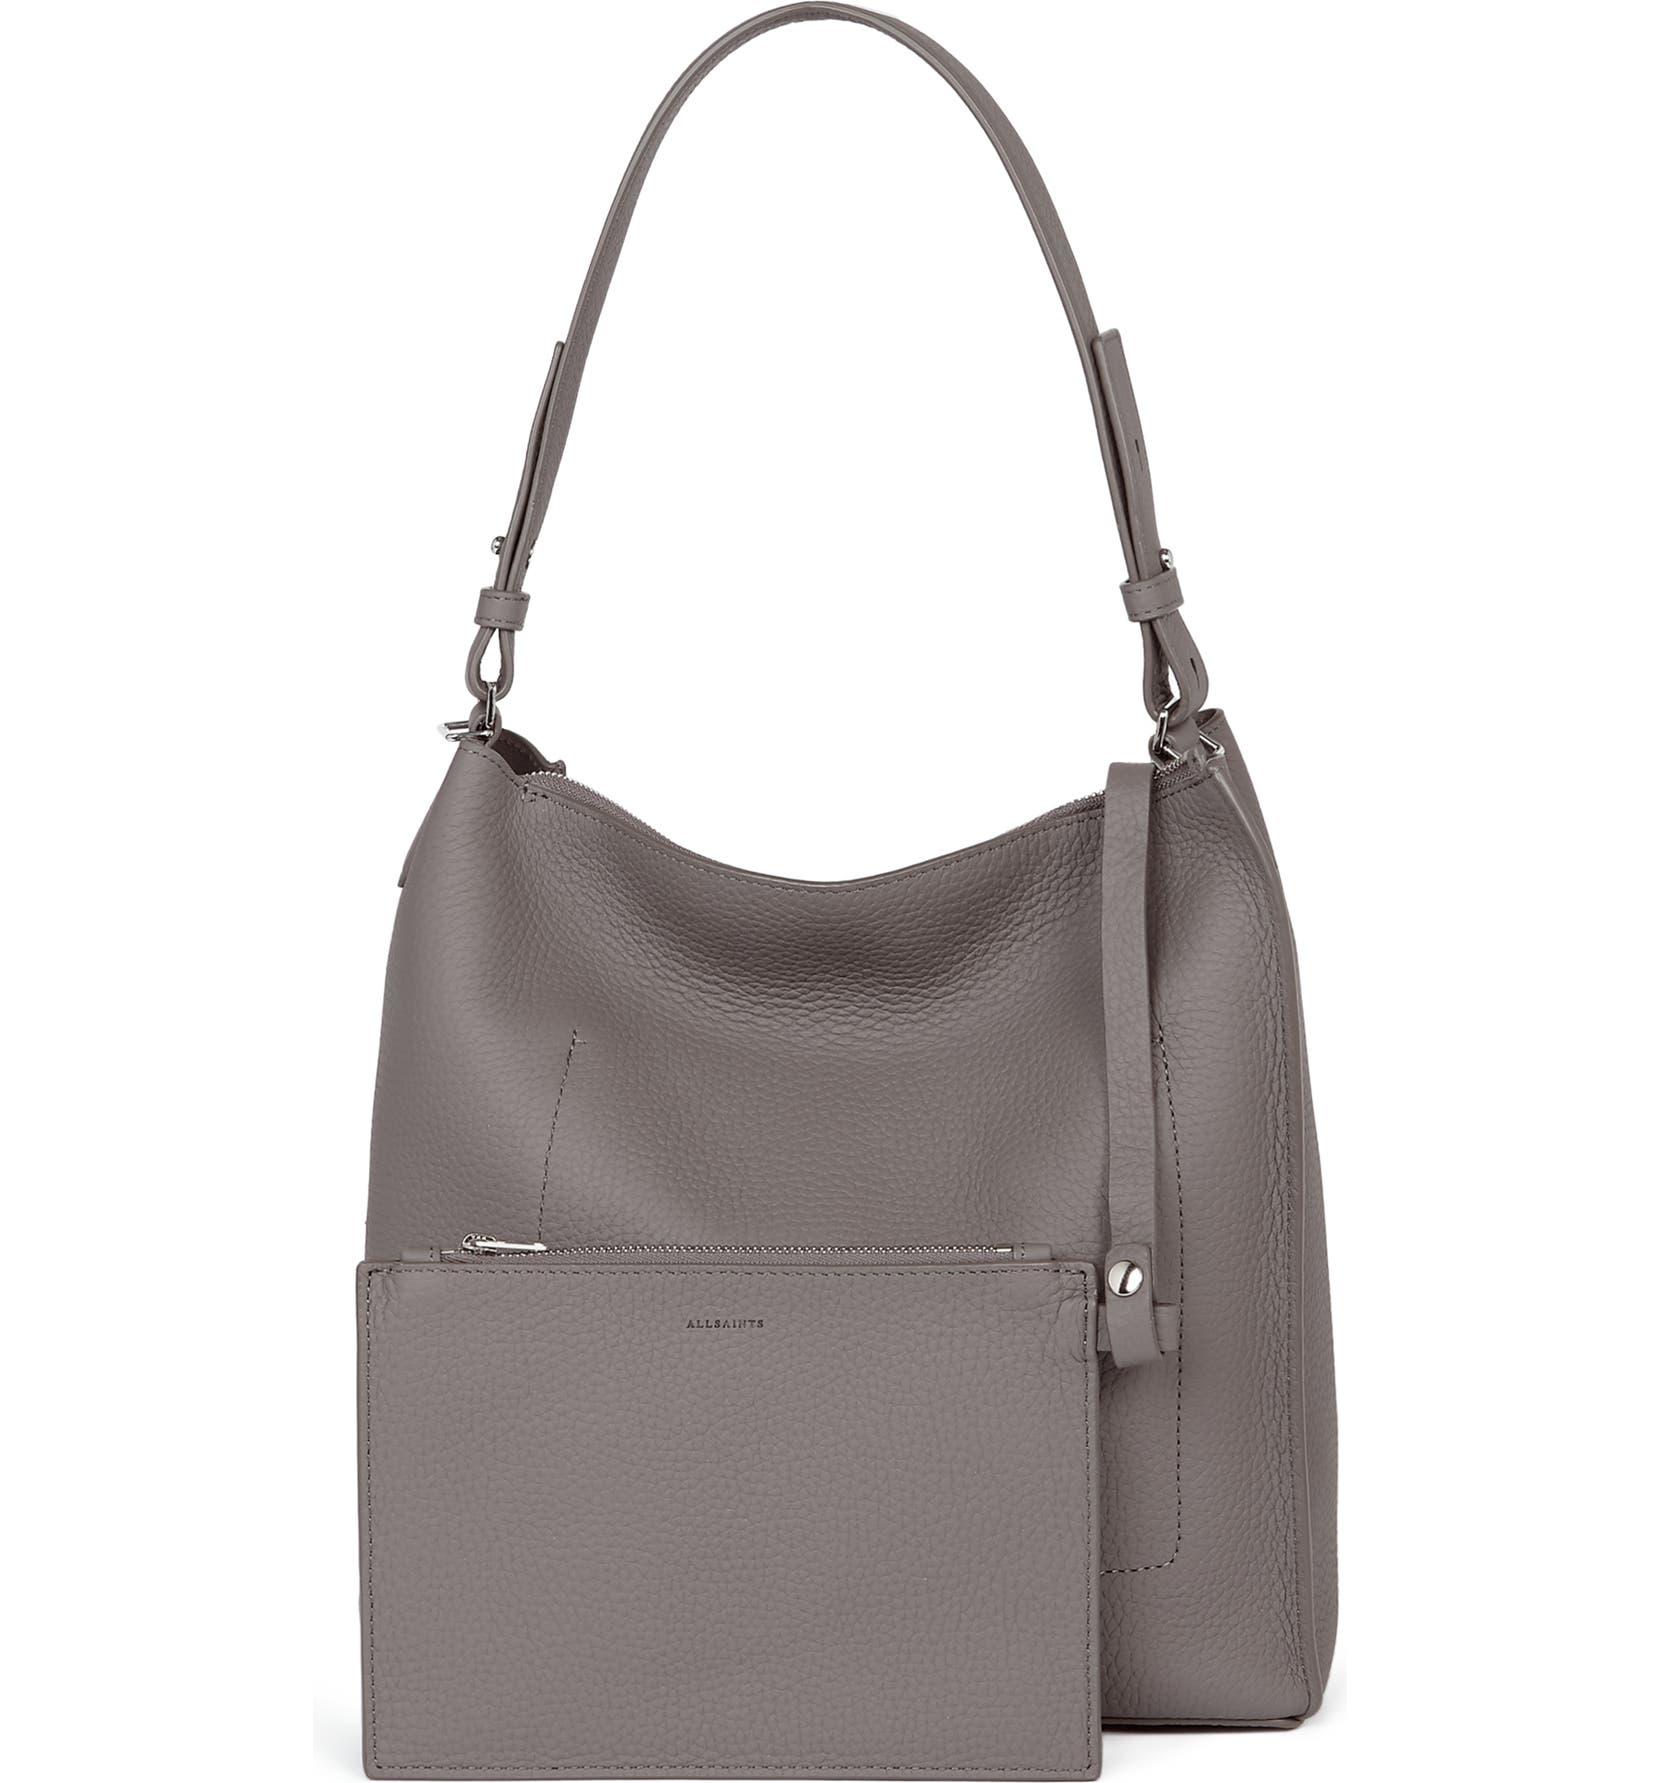 57aa743248 ALLSAINTS  Kita  Leather Shoulder Crossbody Bag